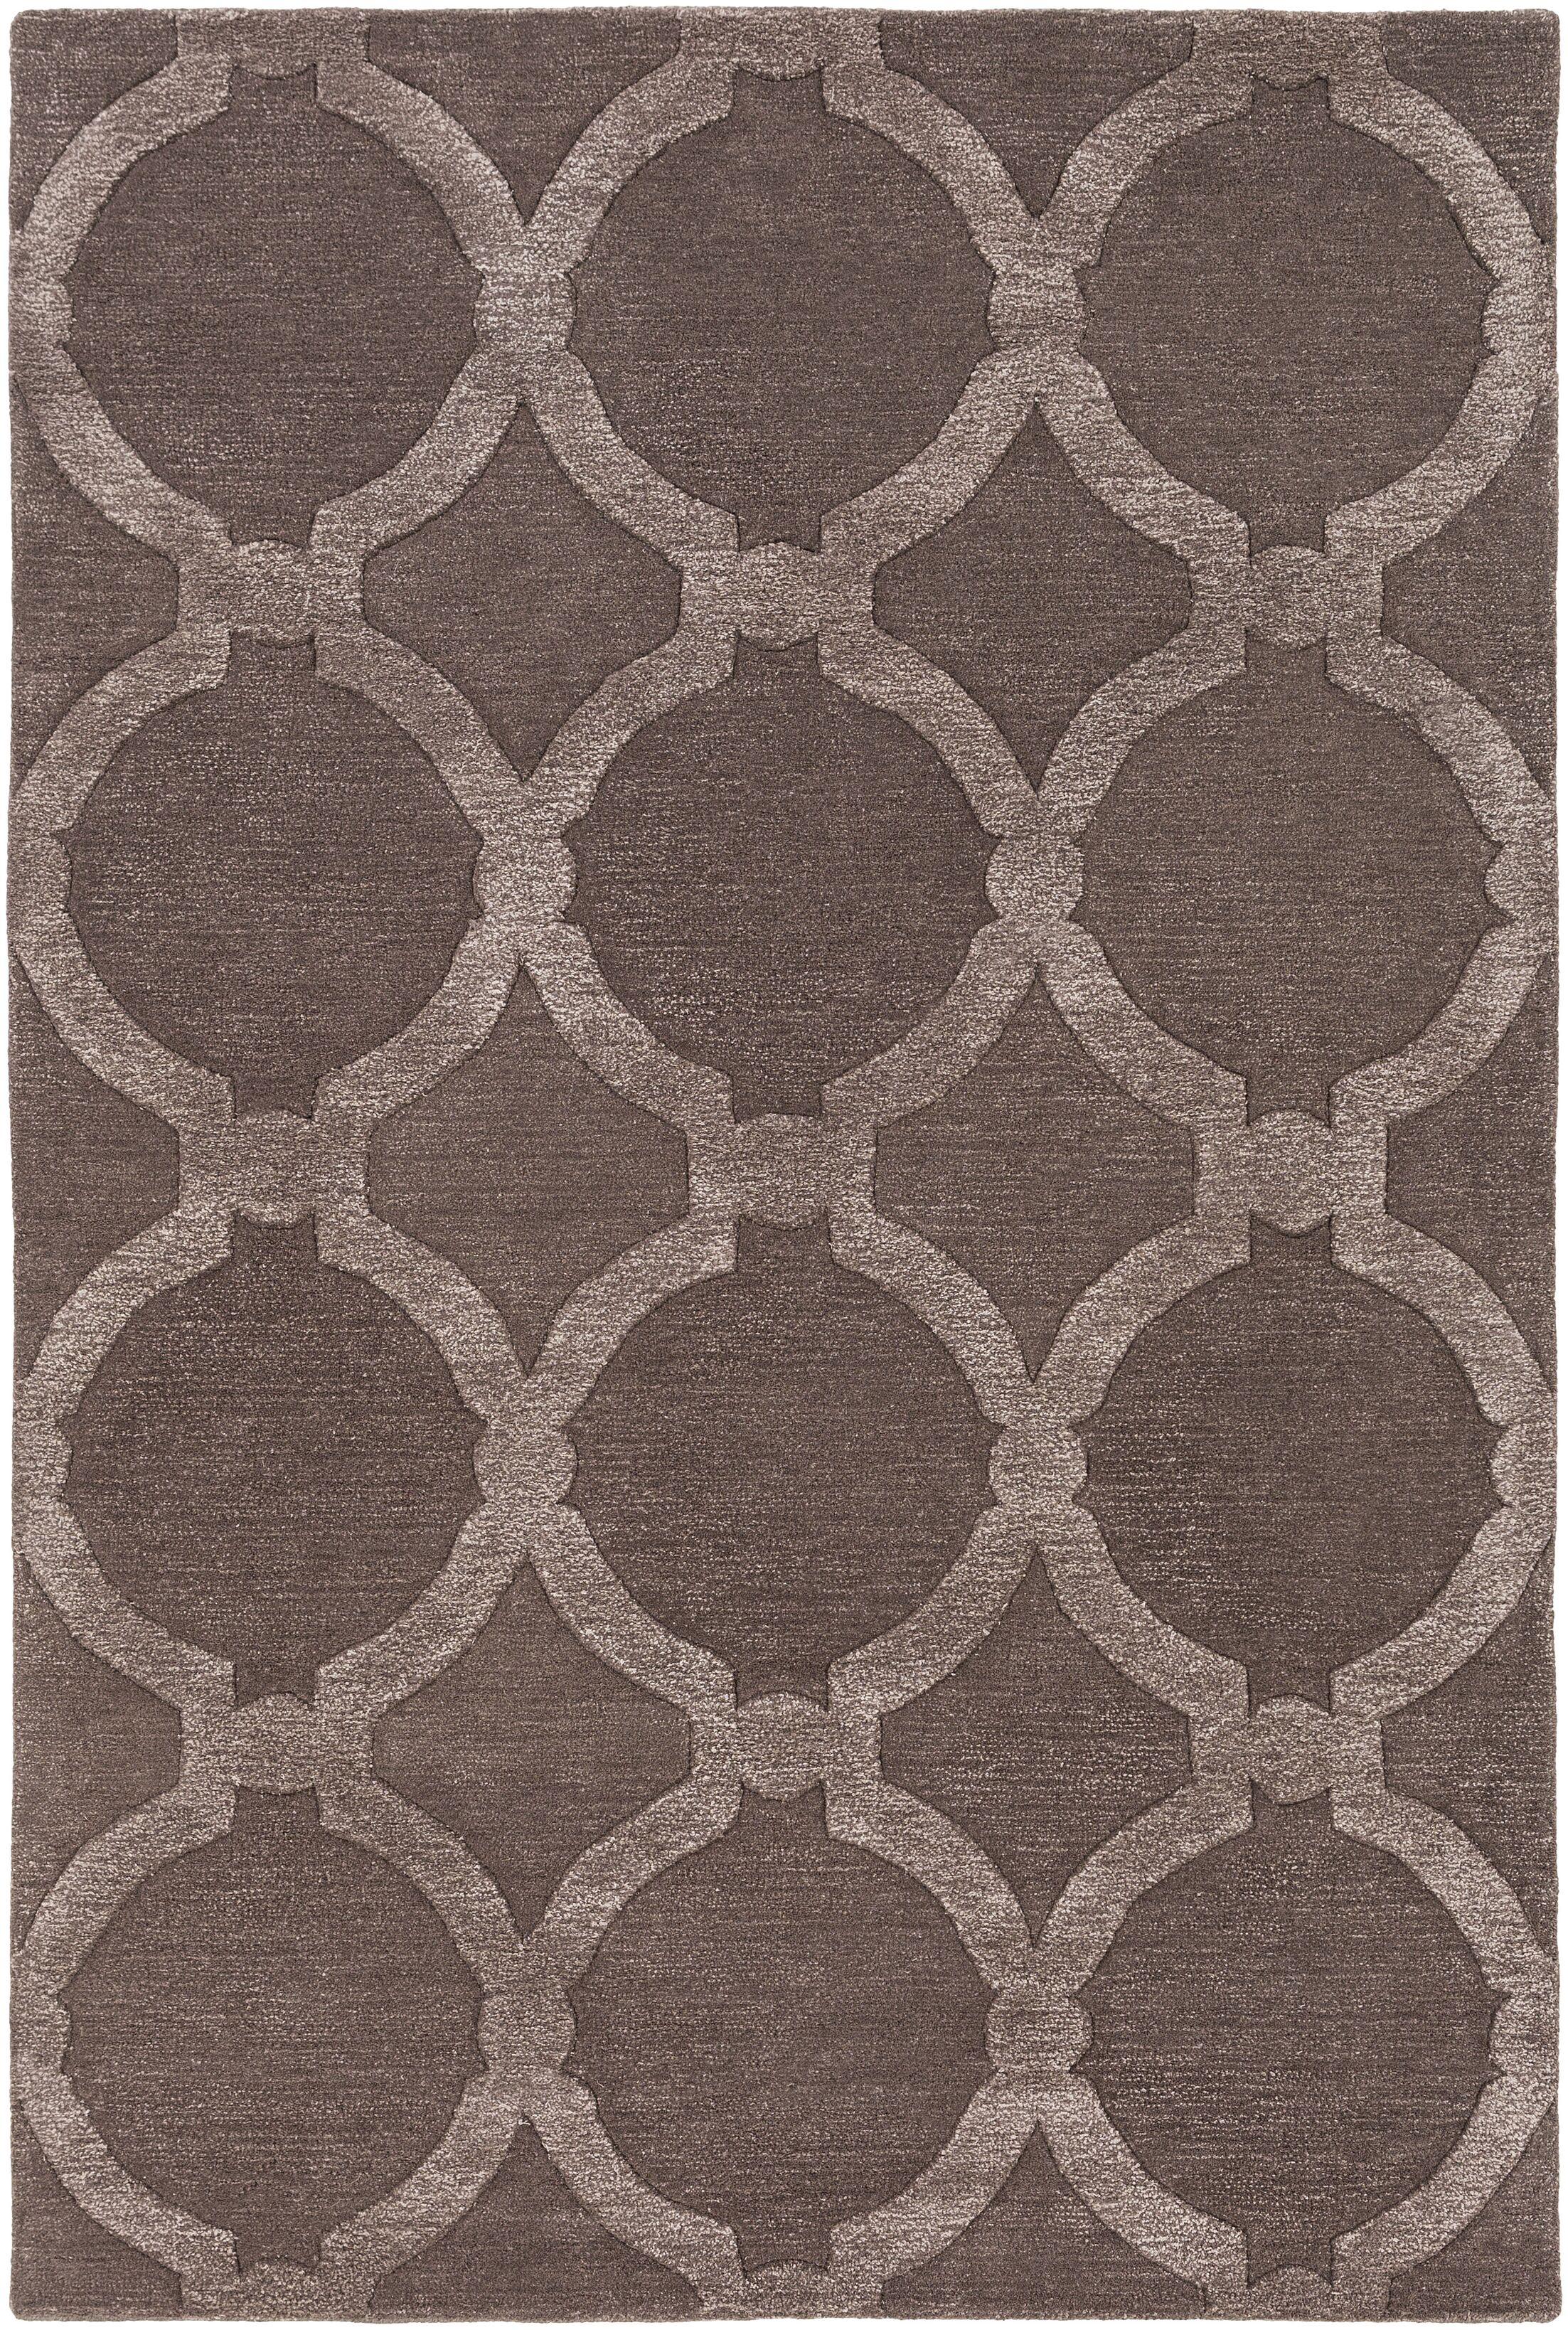 Labastide Hand-Tufted Cocoa Area Rug Rug Size: Rectangle 5' x 7'6